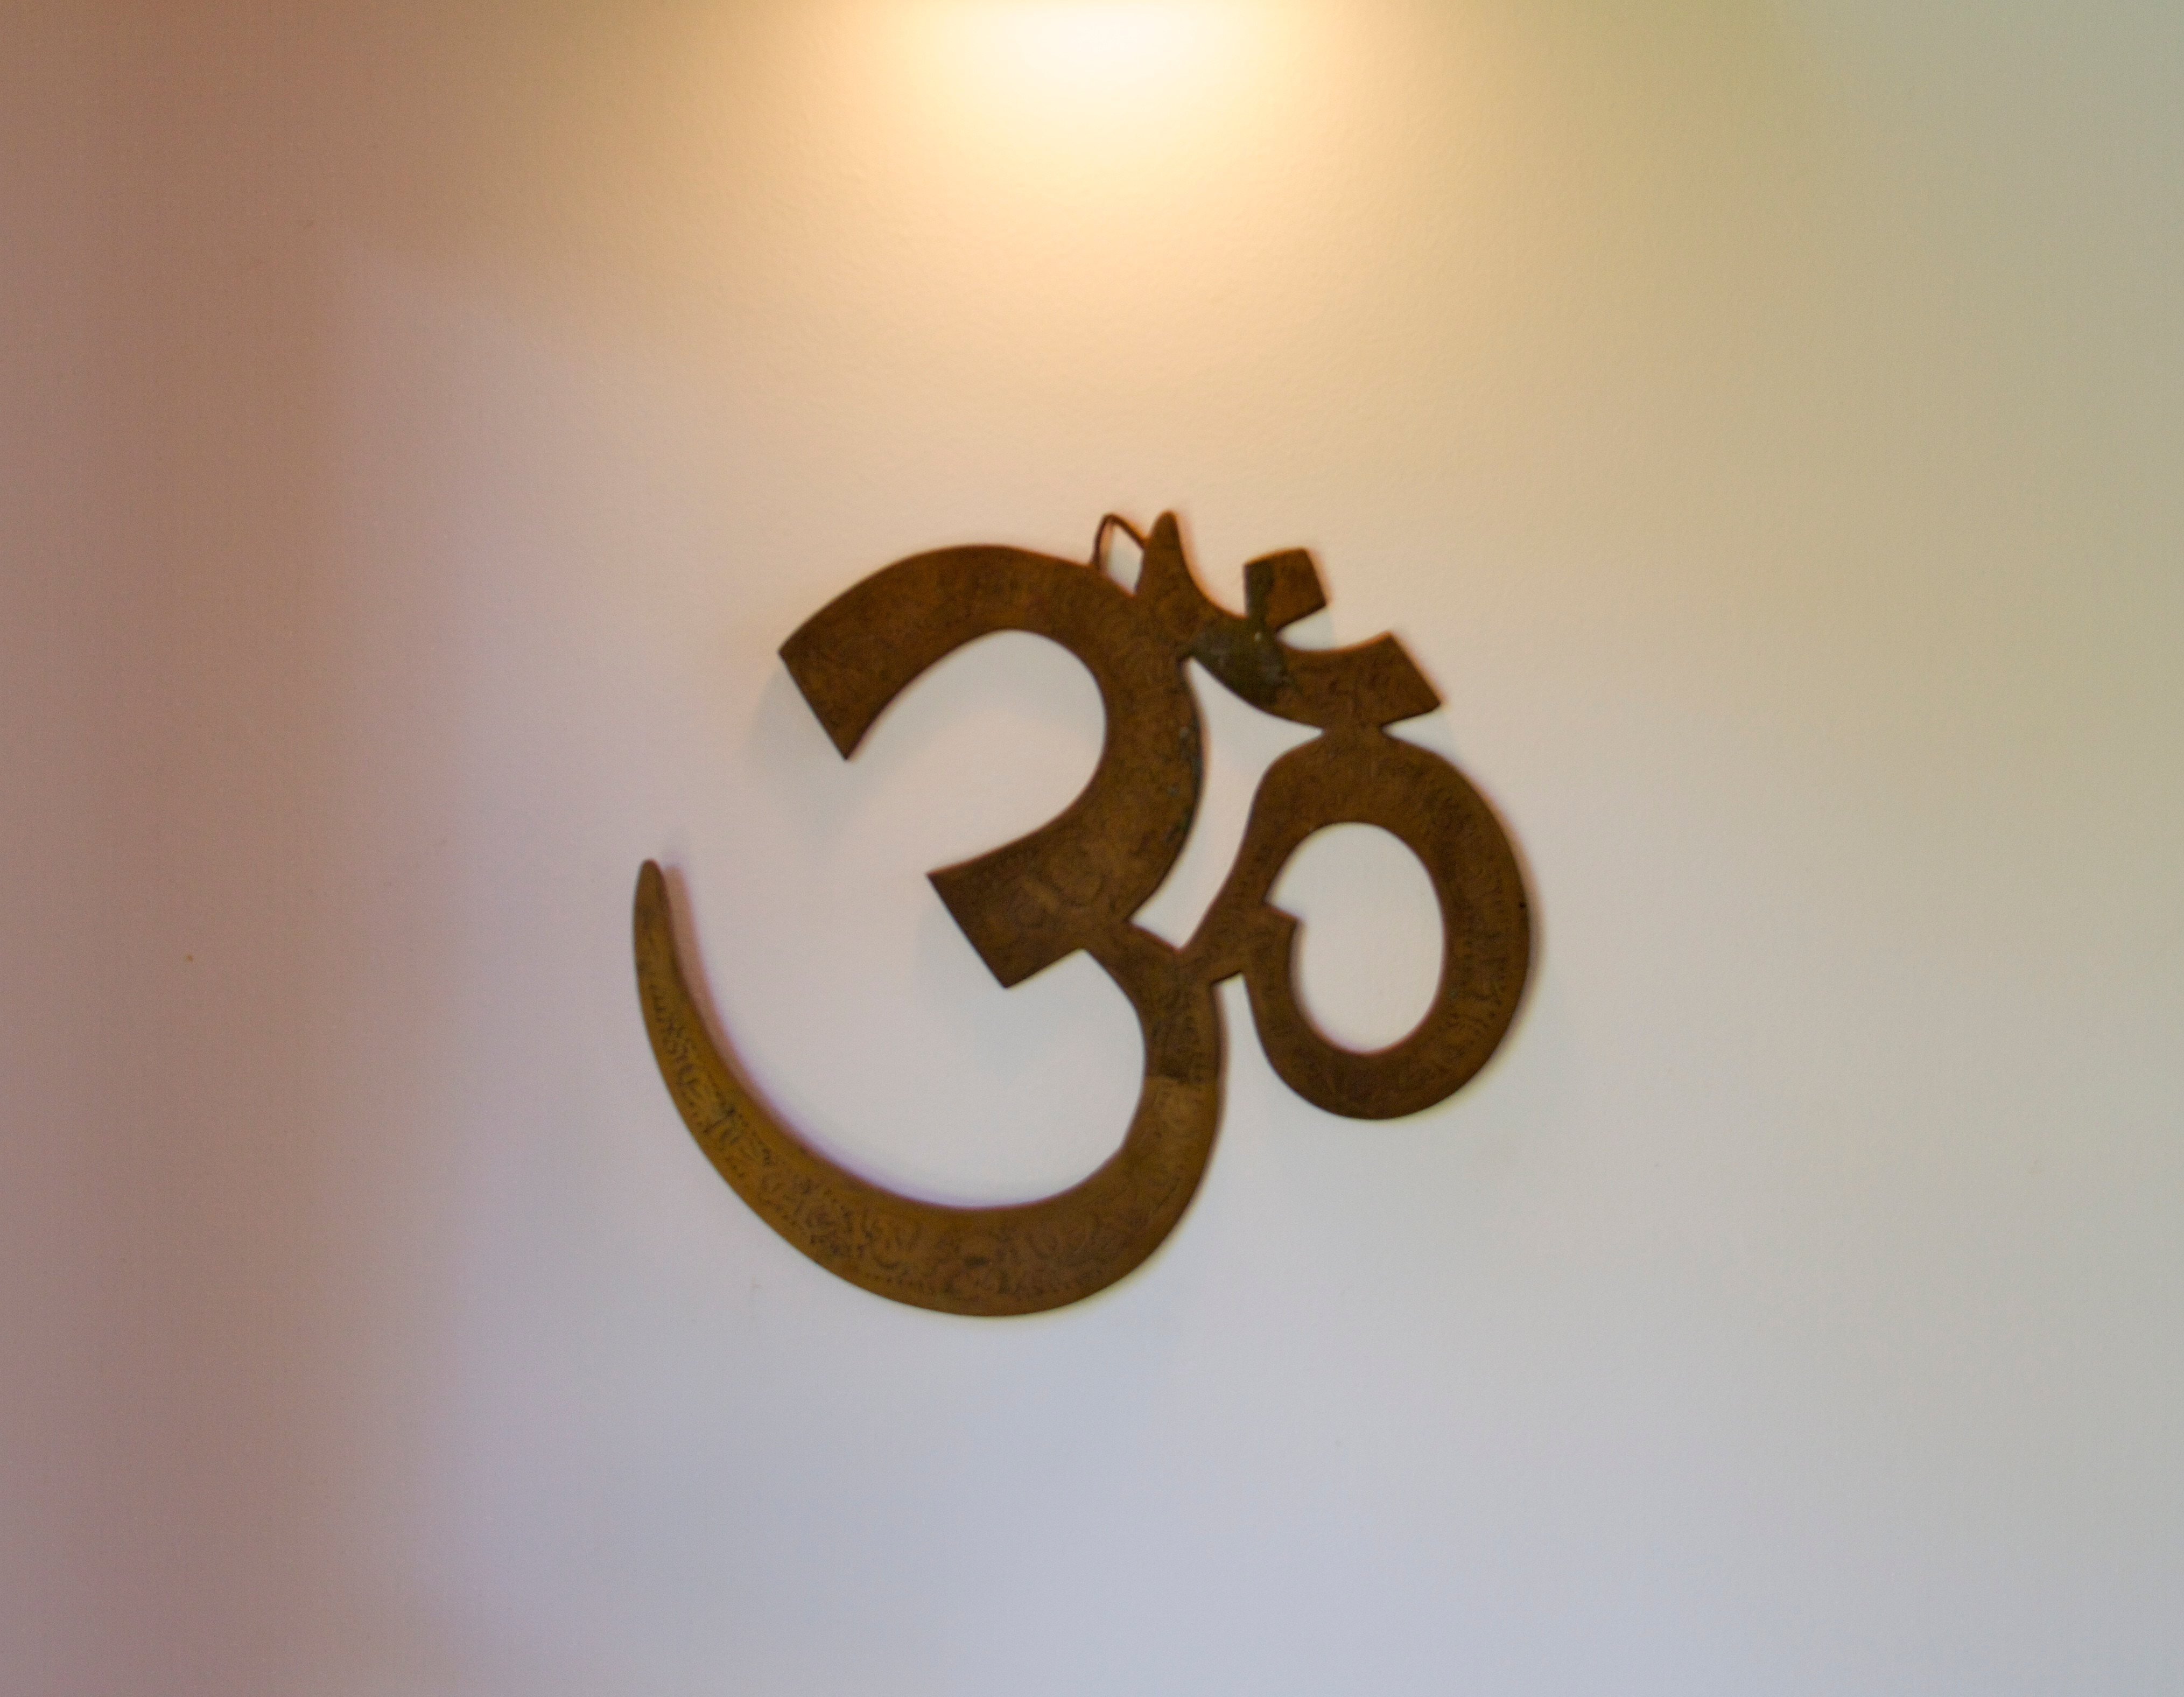 Sunday 4-5pm Restorative/Yin